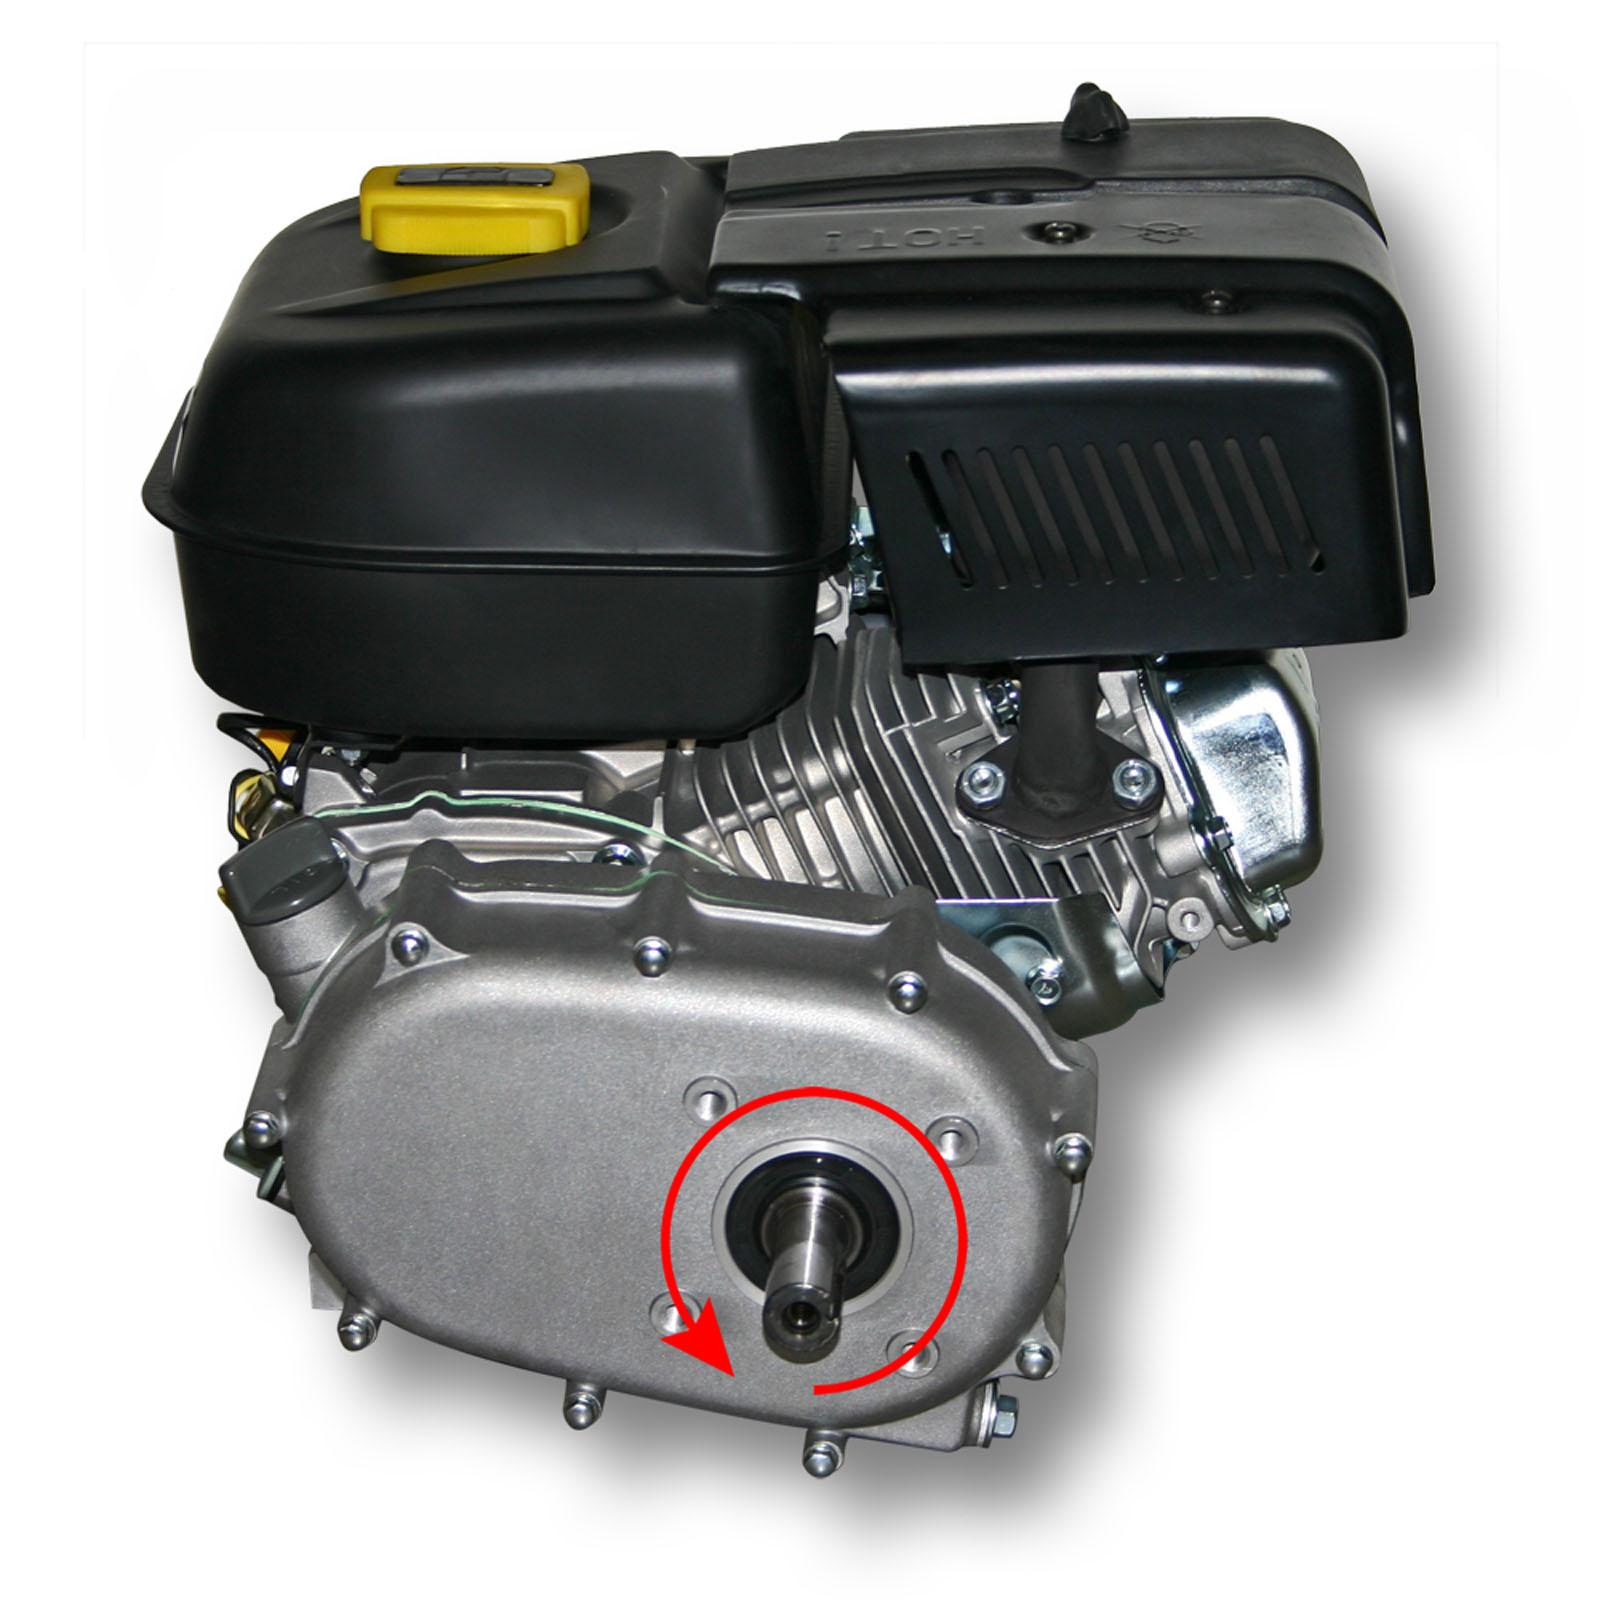 lifan 168 moteur essence 6 5cv lanceur reducteur 2 1 embrayage. Black Bedroom Furniture Sets. Home Design Ideas